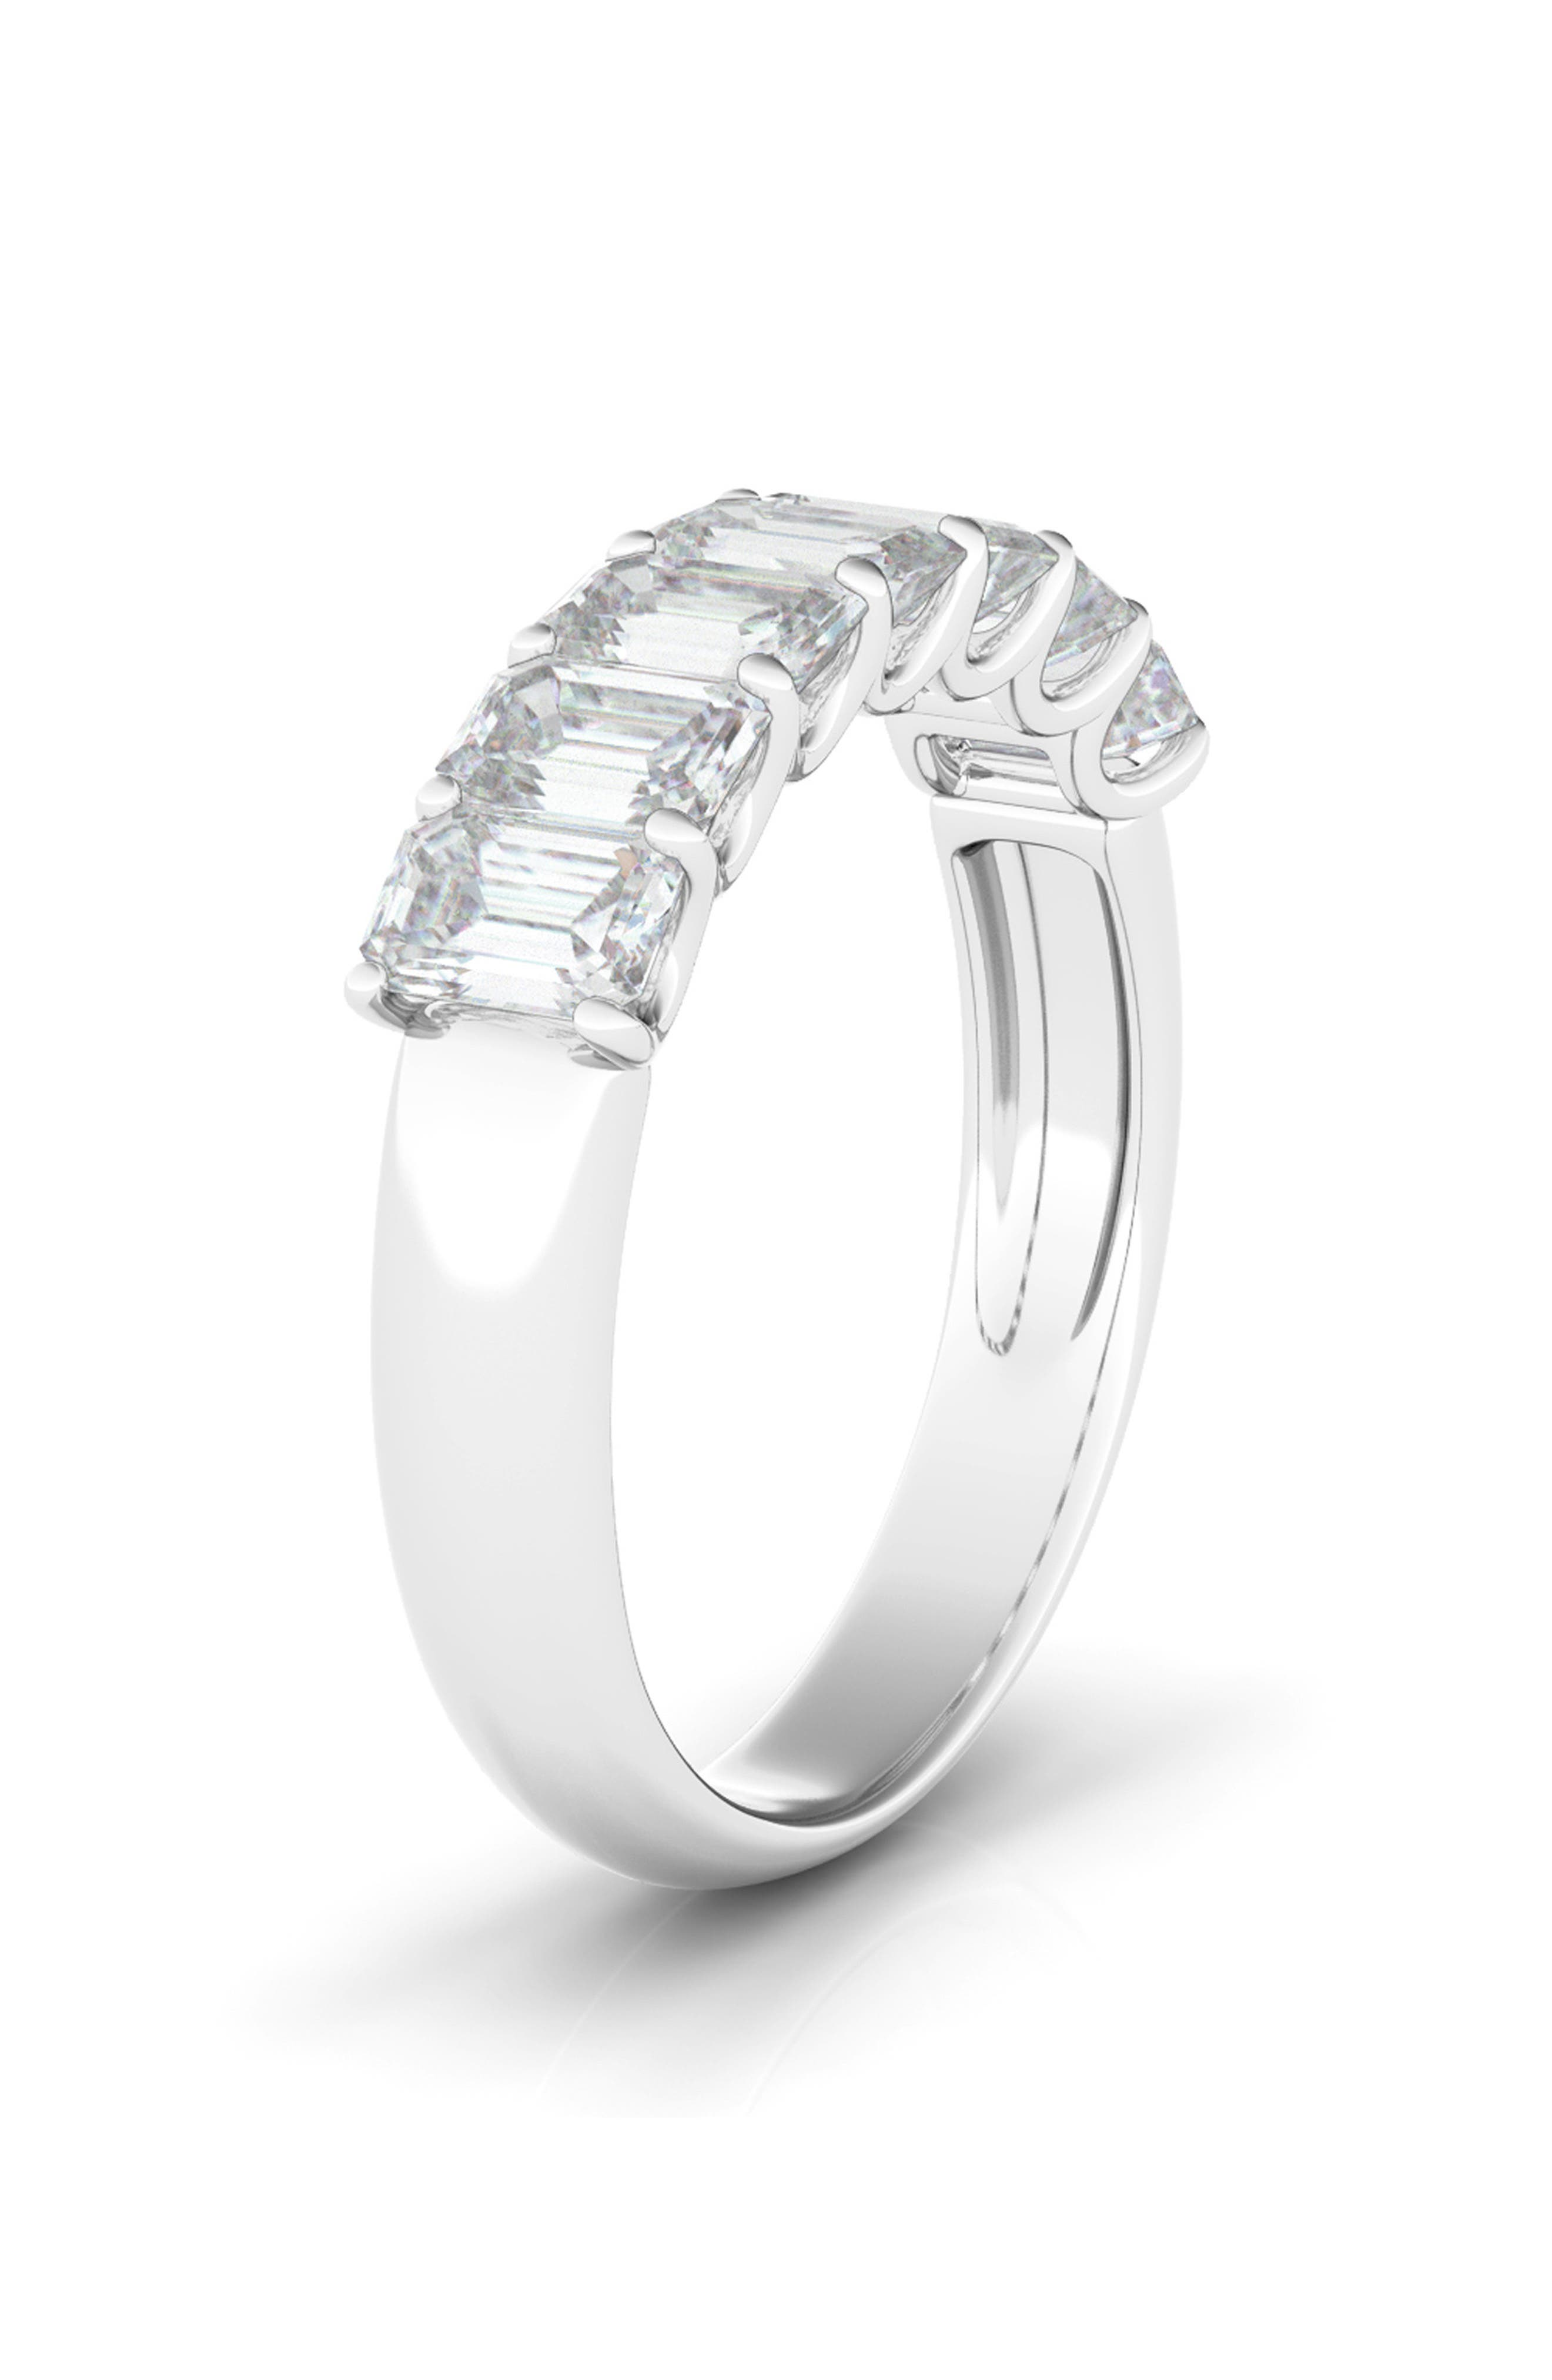 Half Emerald Cut Lab Created Diamond 14K Gold Eternity Ring